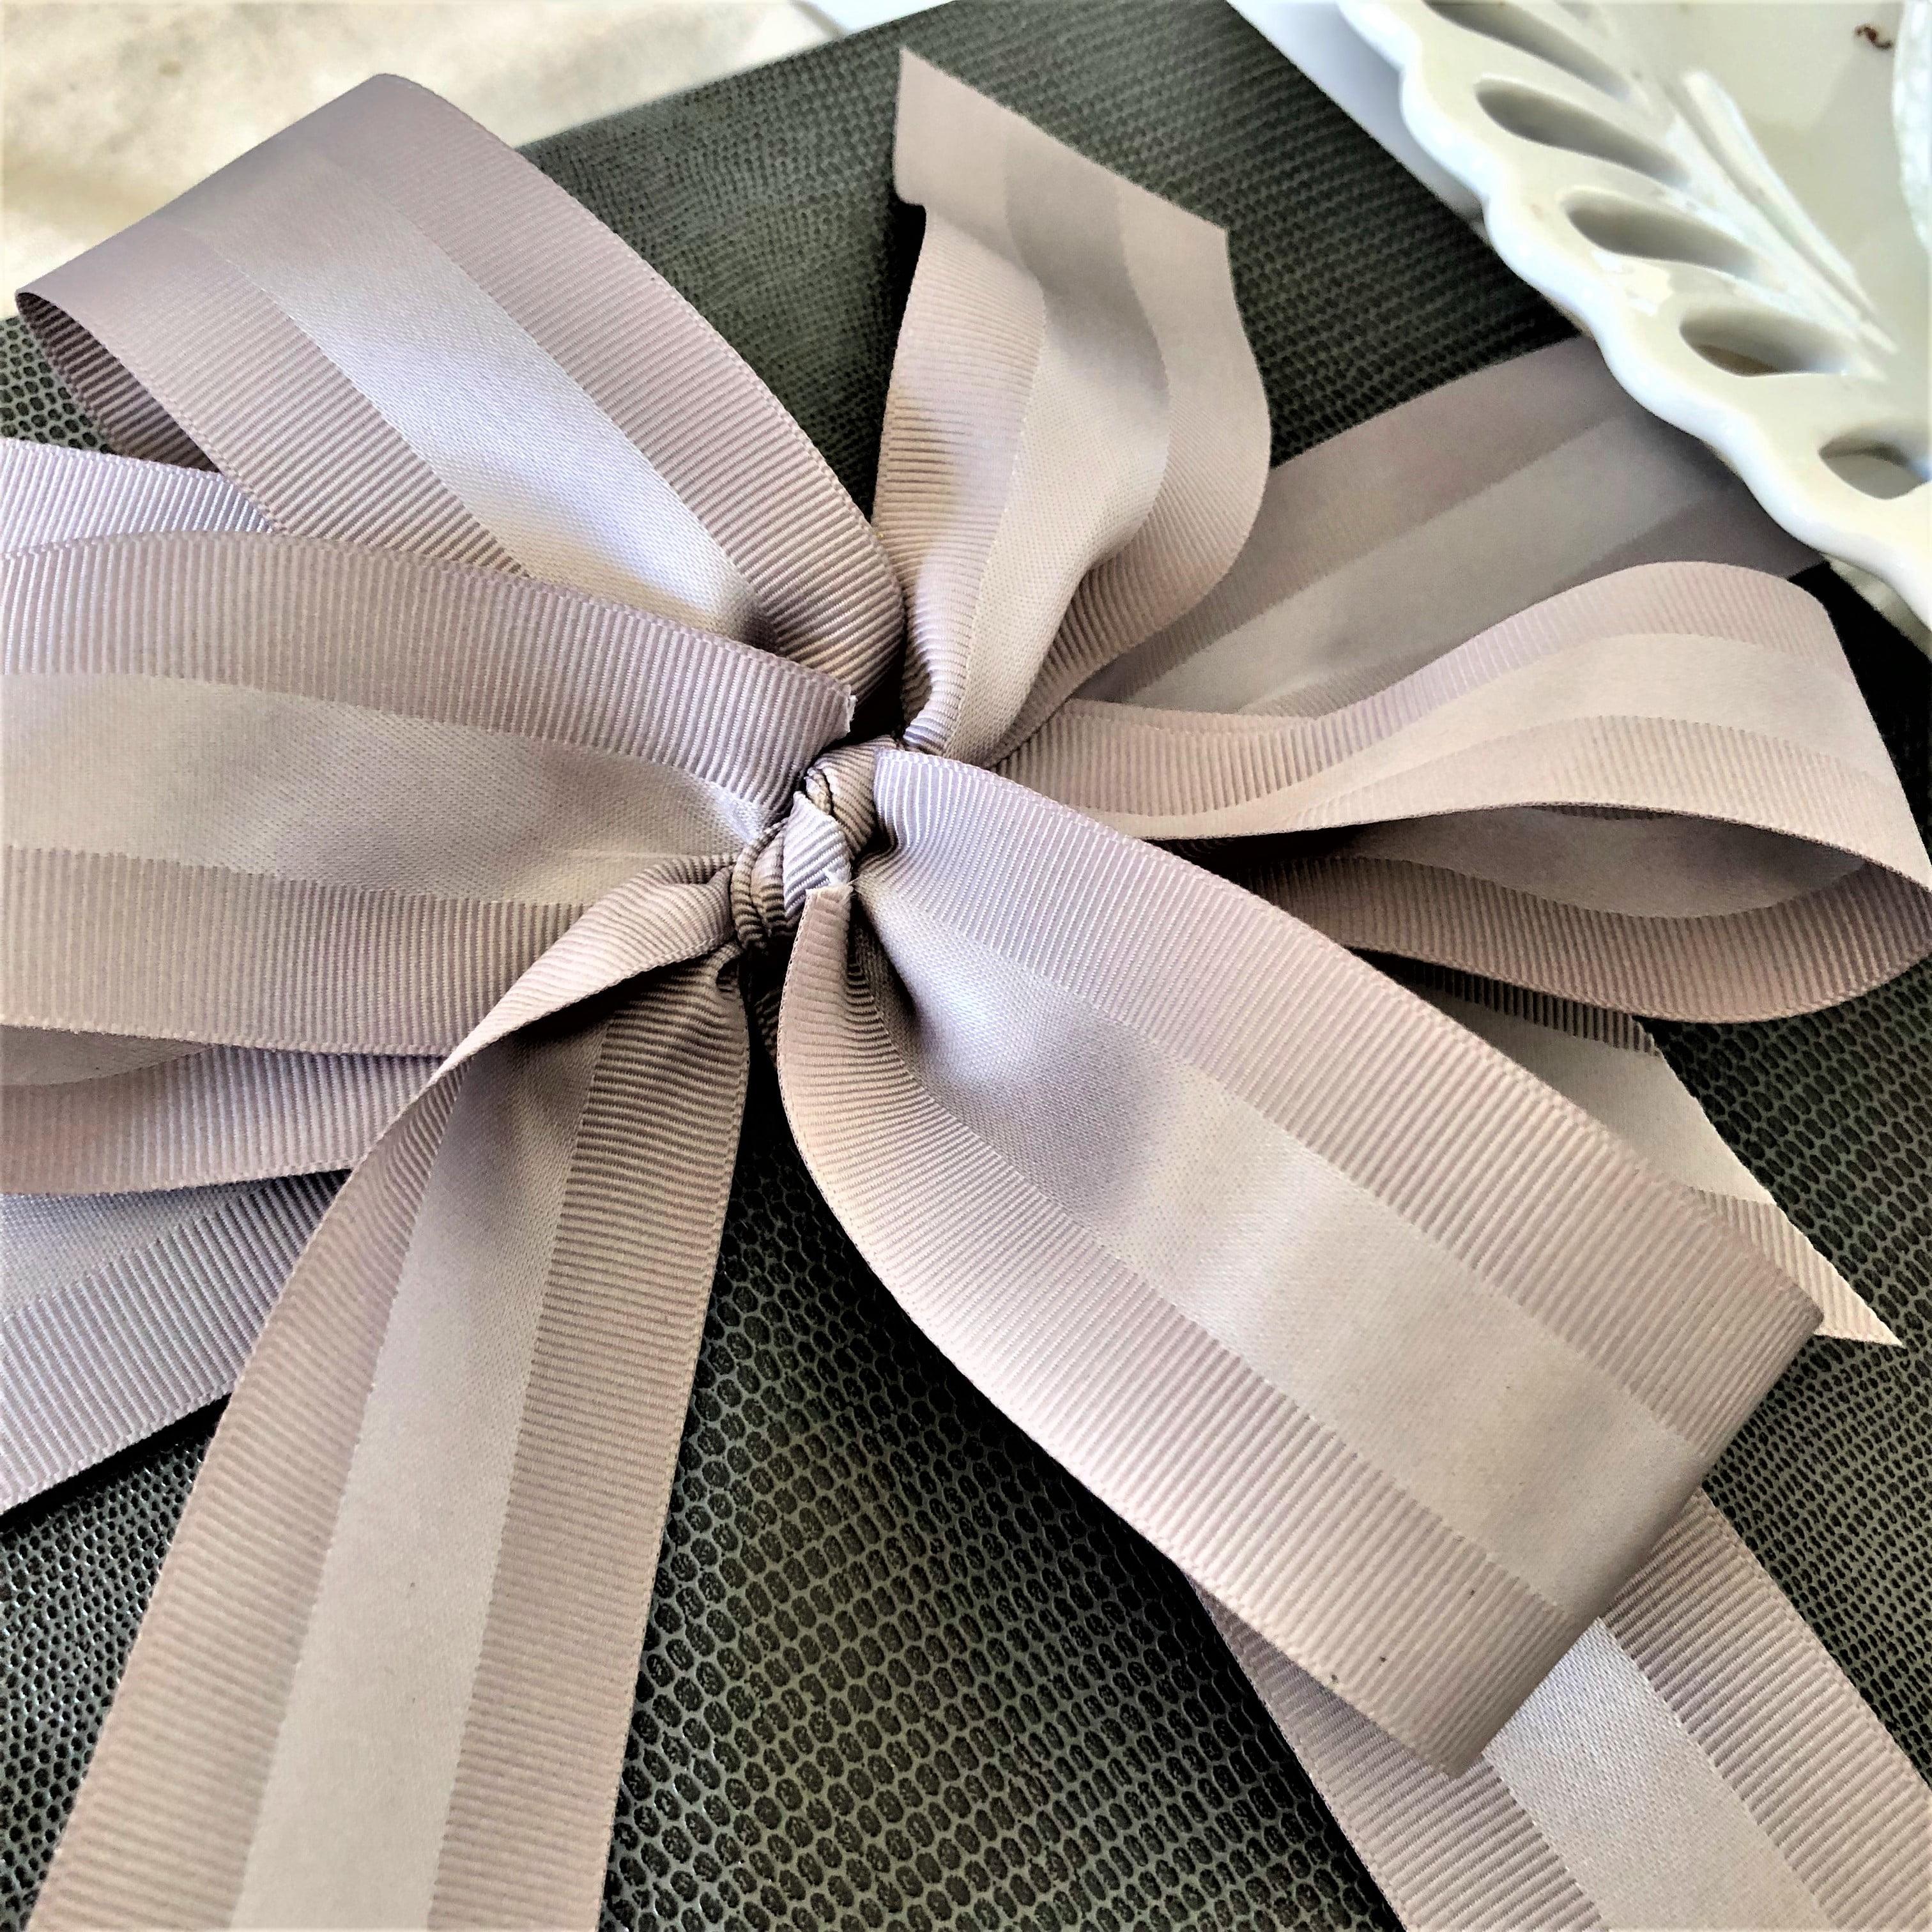 wedding ribbon Craft ribbon double faced satin ribbon 1.5 inch width 50 yard spool RED Ribbon Special Occasion cake decorating ribbon